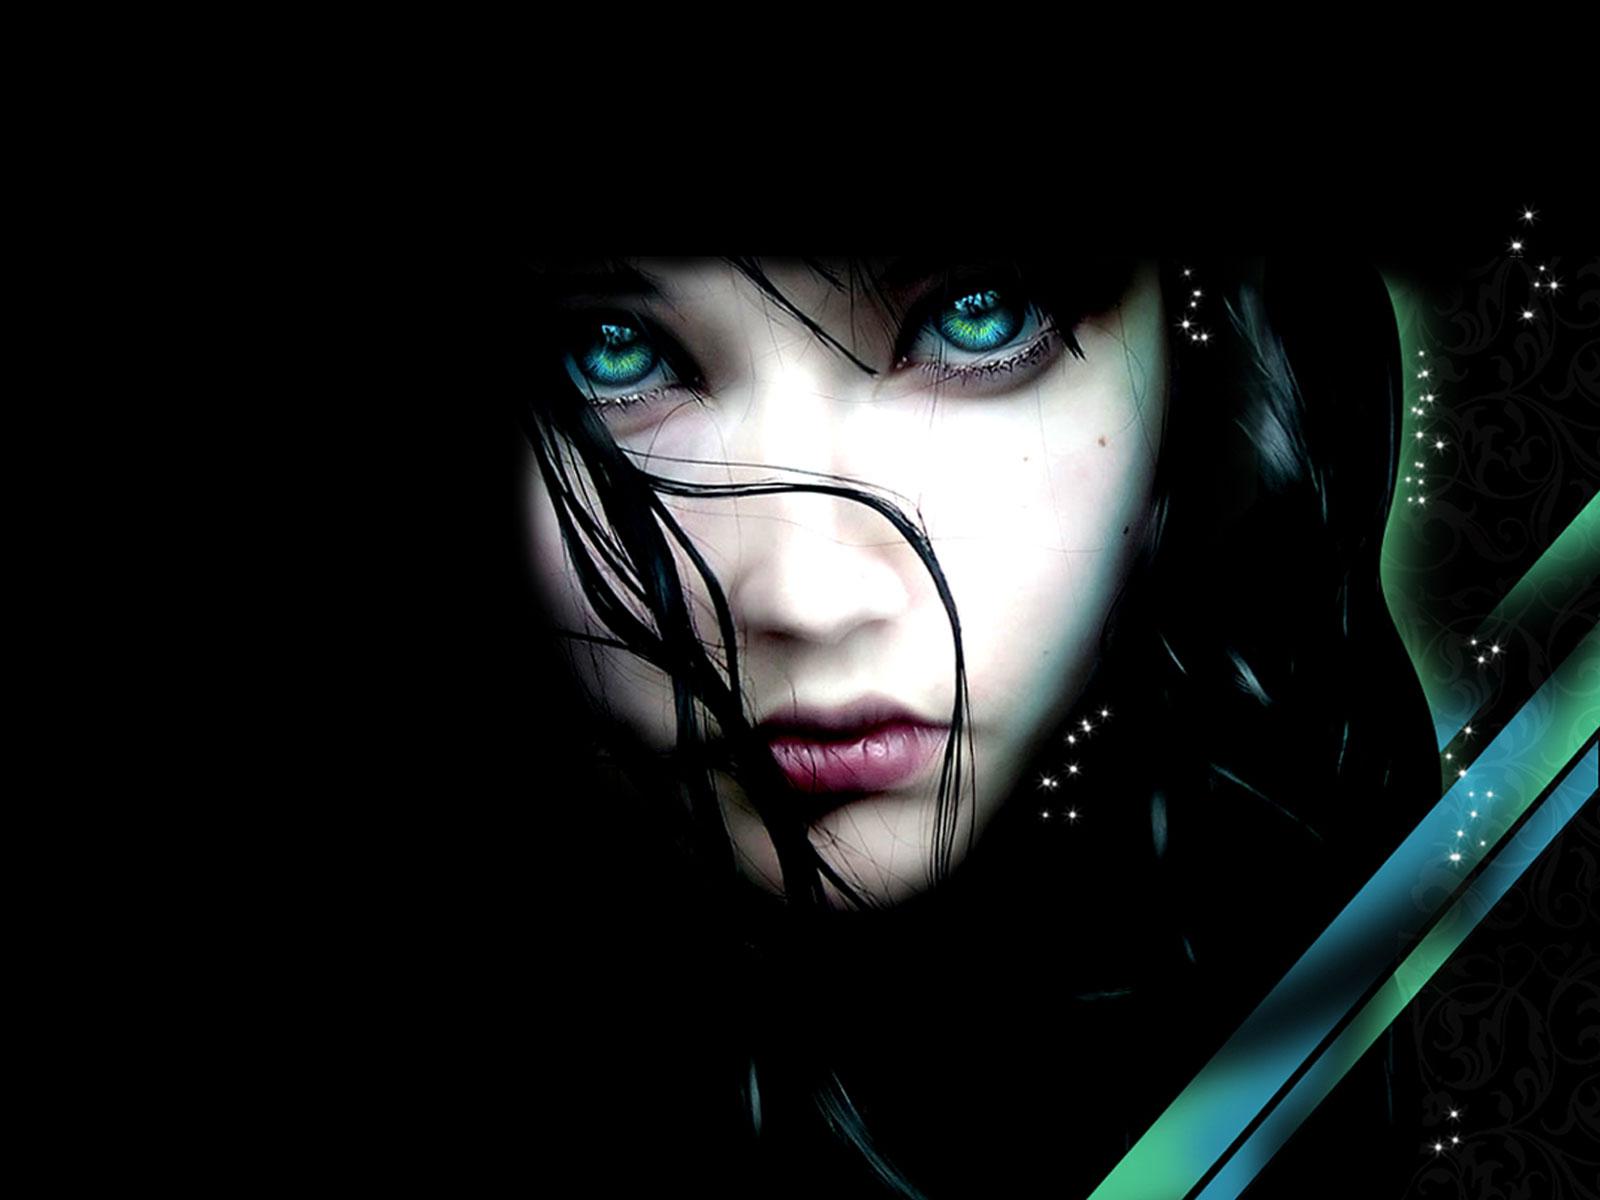 ... /s1600/fantasy-girl-desktop-wallpaper-wallpapers_17829_1600x1200.jpg